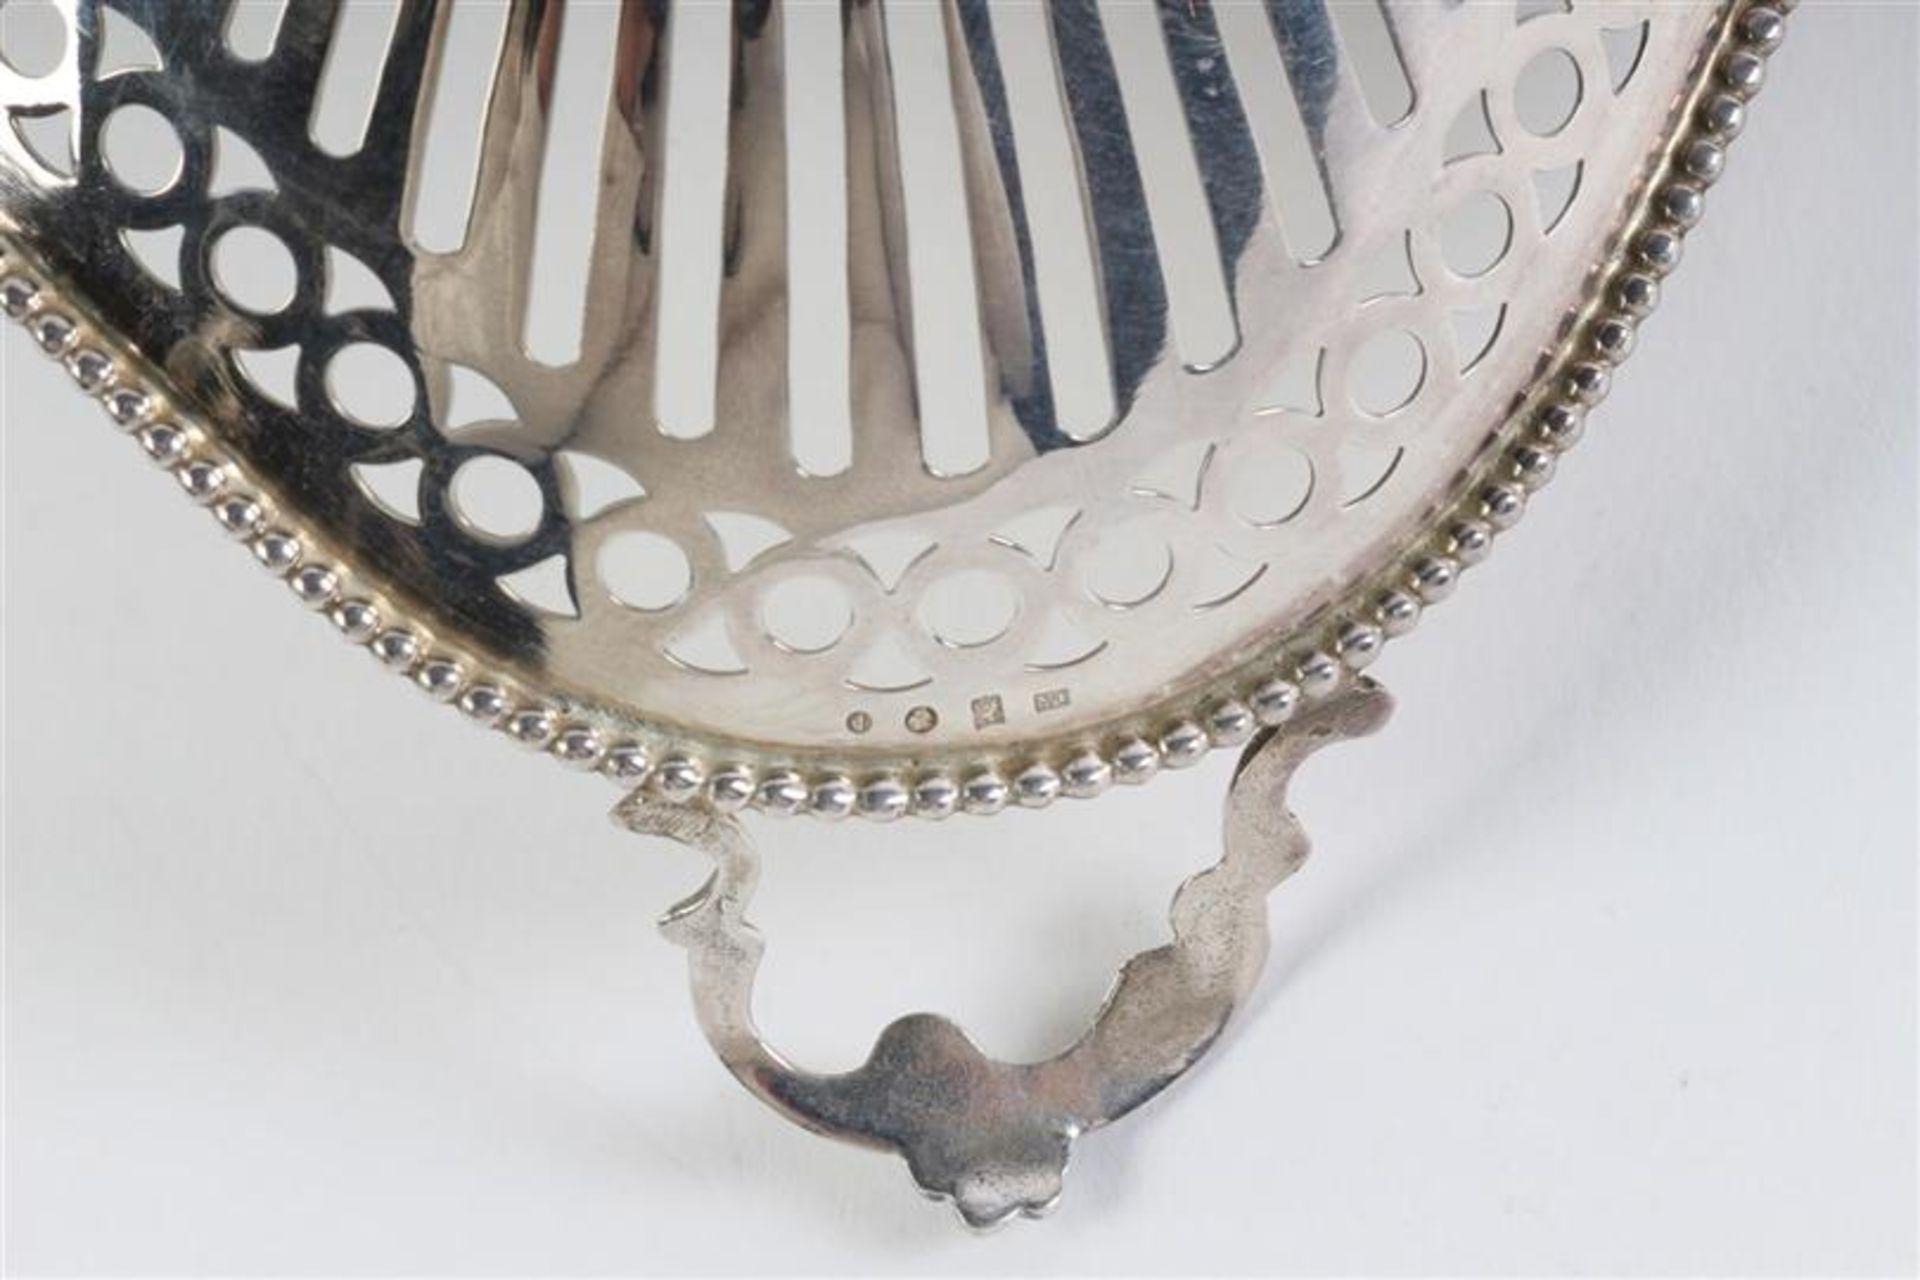 Zilveren bonbonmandje met parelrand, Holland, 20e eeuw. L: 16 cm. Gewicht: 82 g. - Bild 4 aus 4